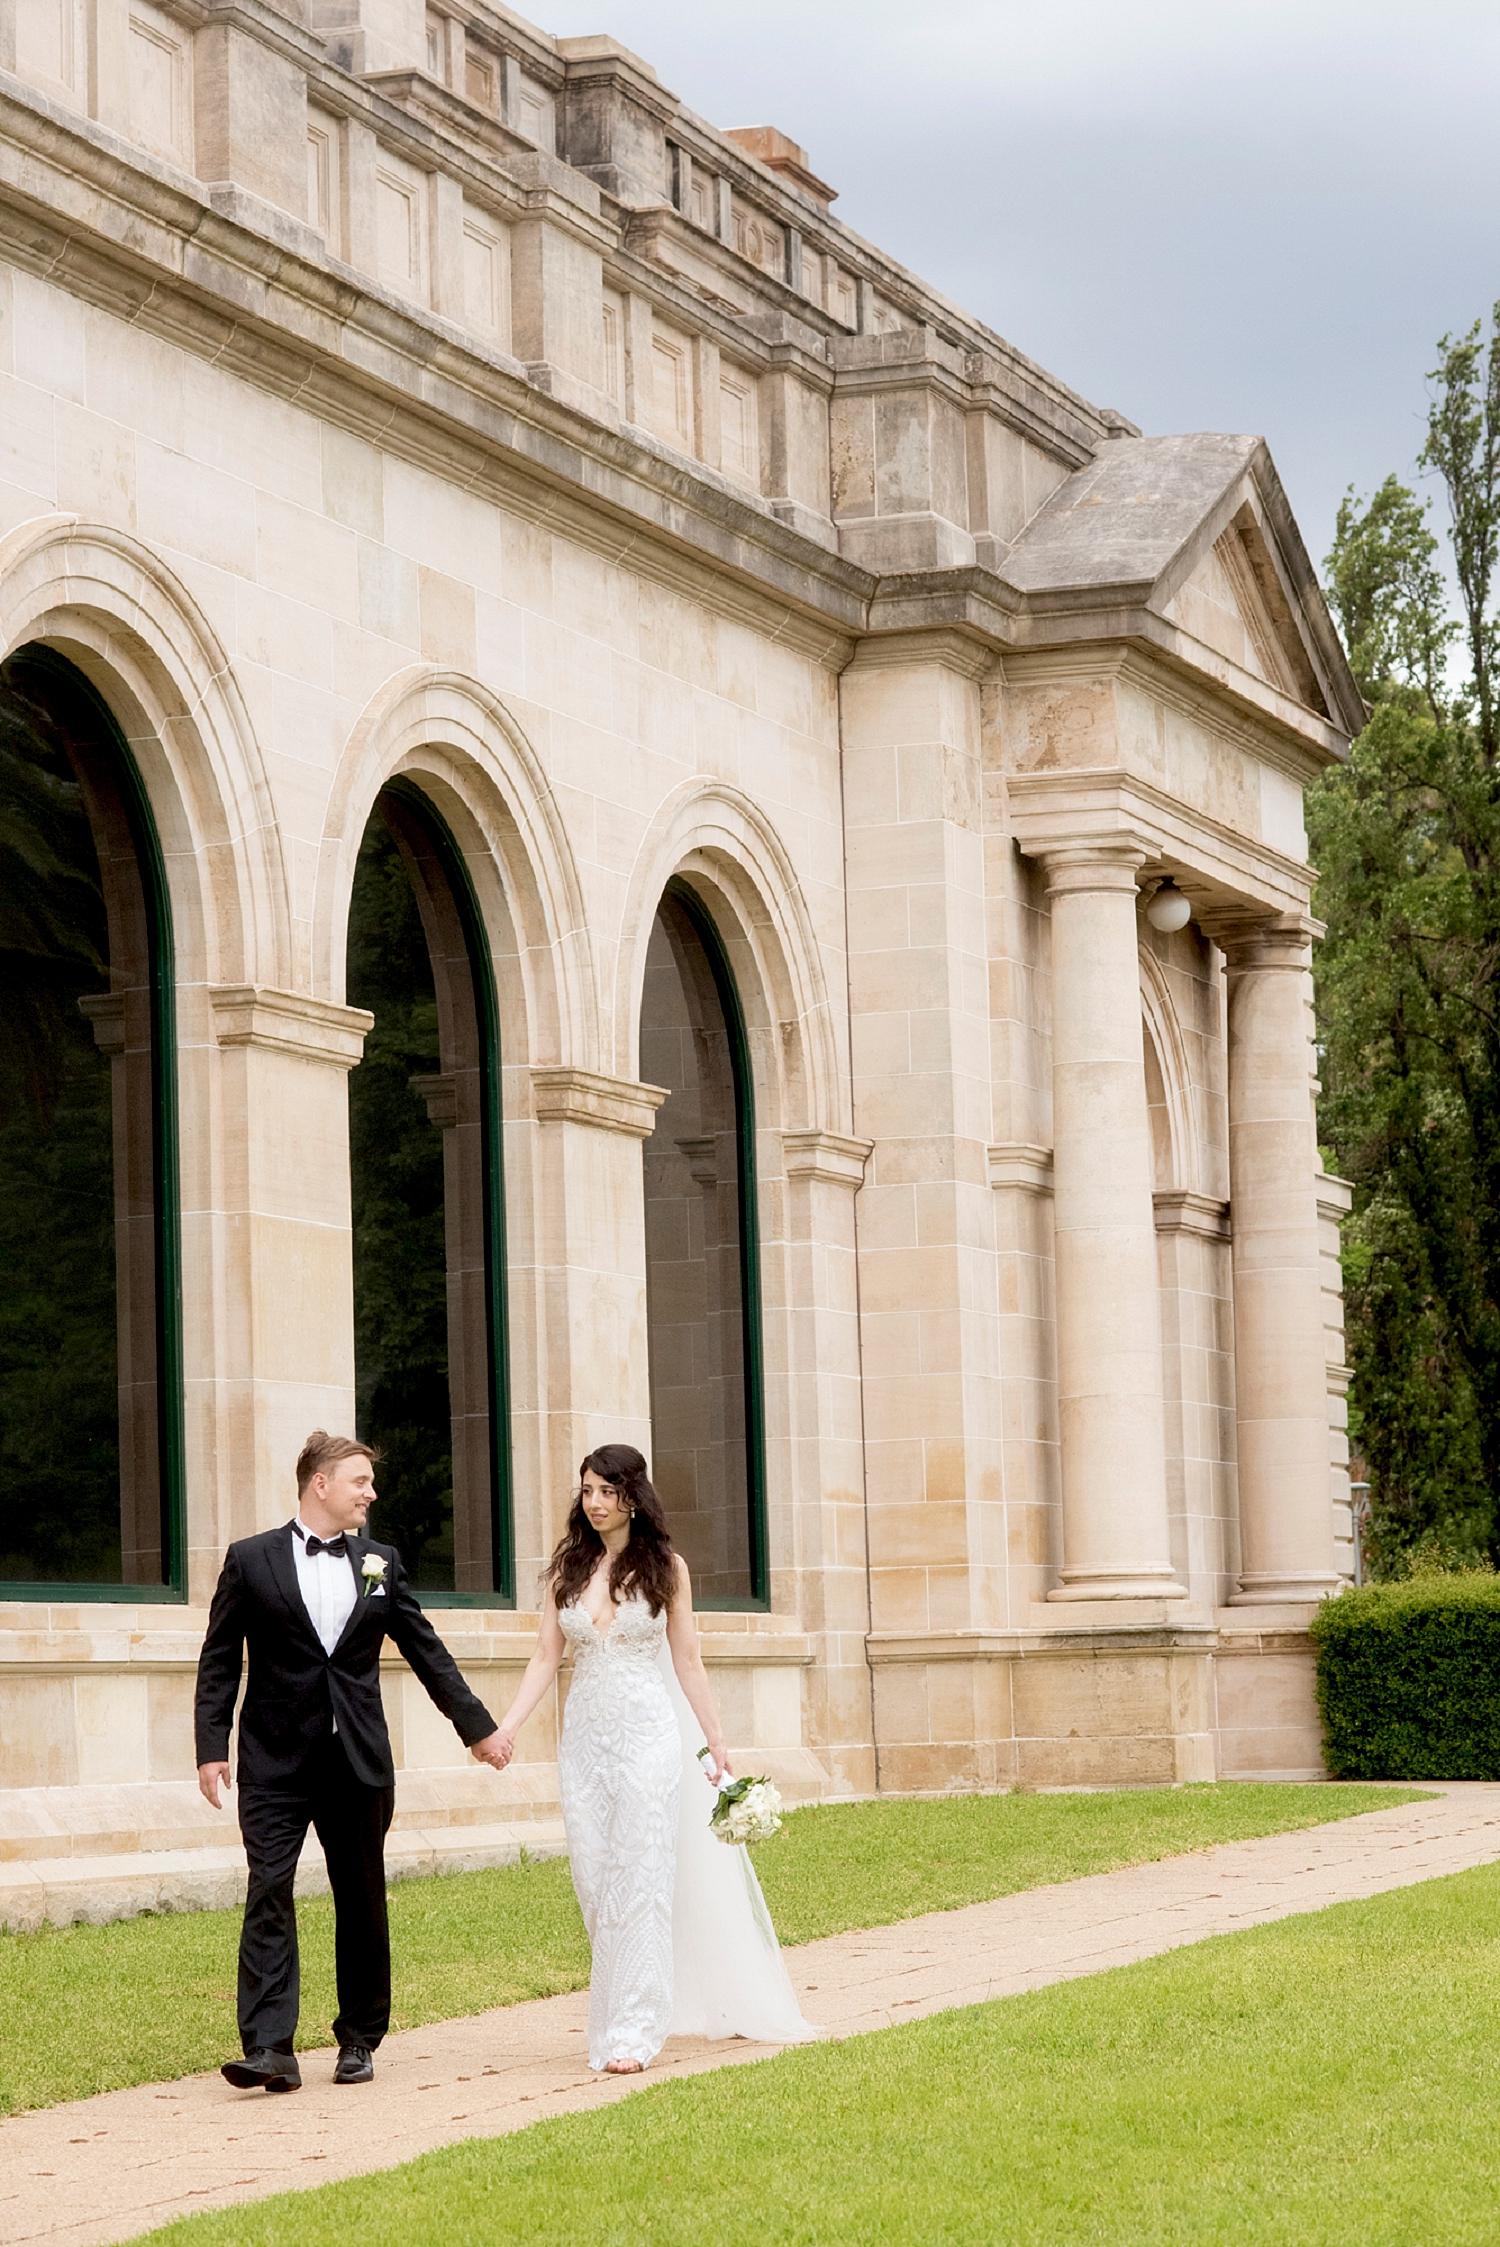 19_perth wedding photographer deray simcoe .jpg